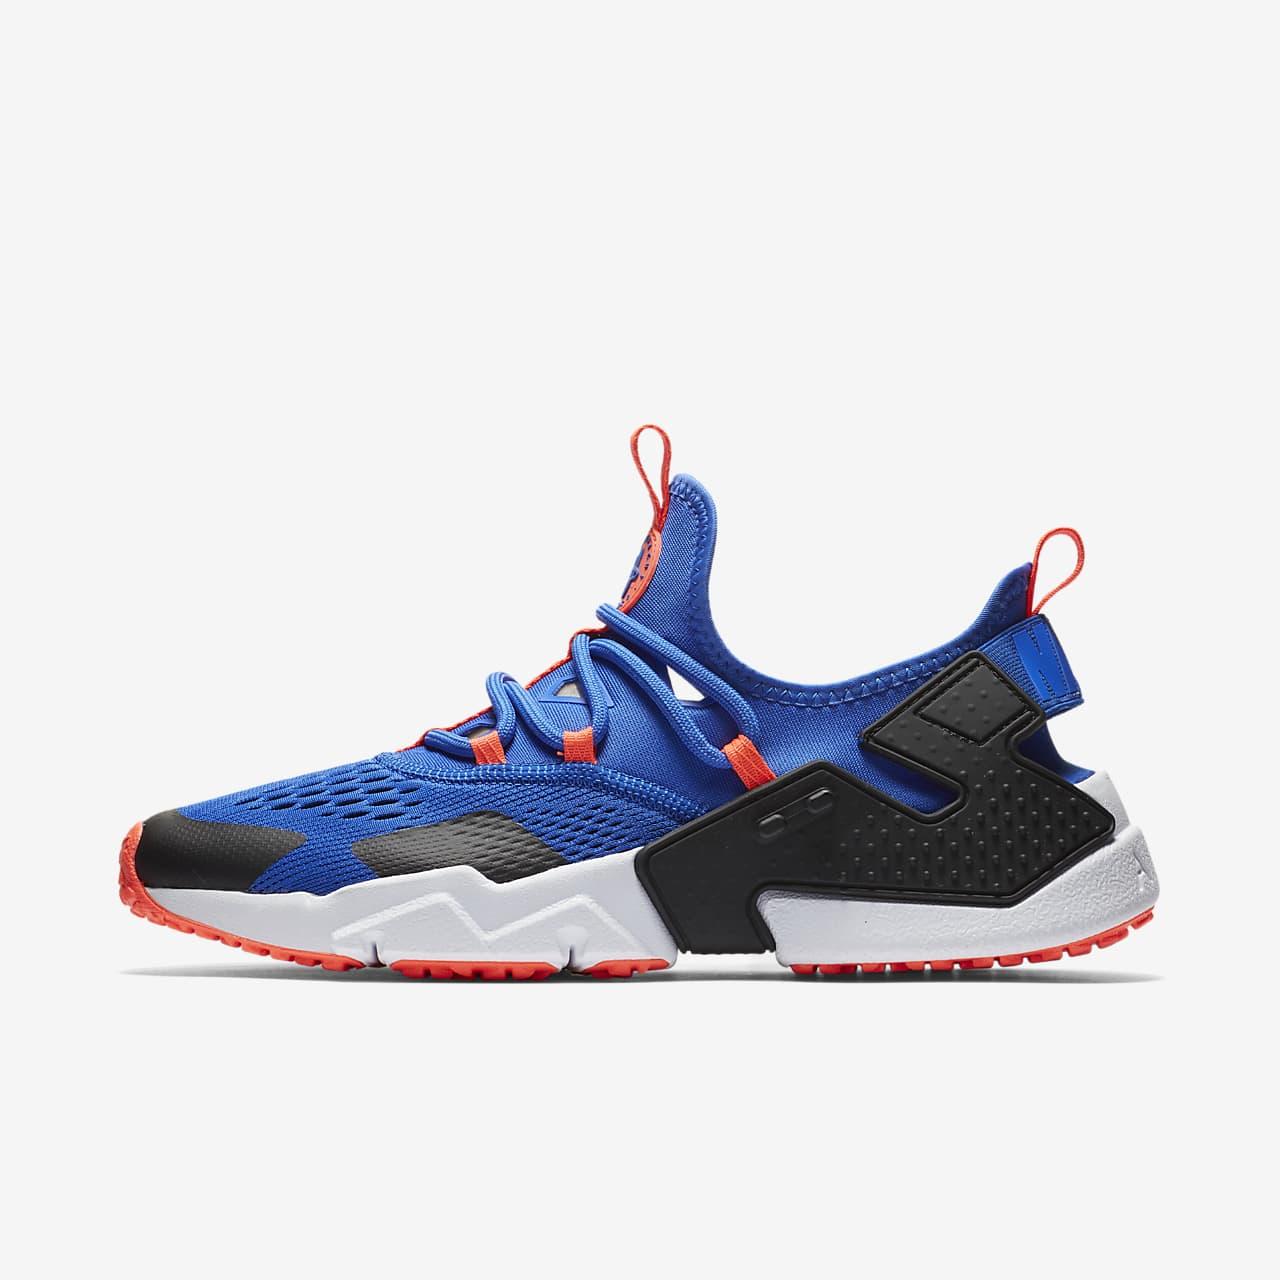 Nike Air Huarache Drift Breathe Men's Shoe